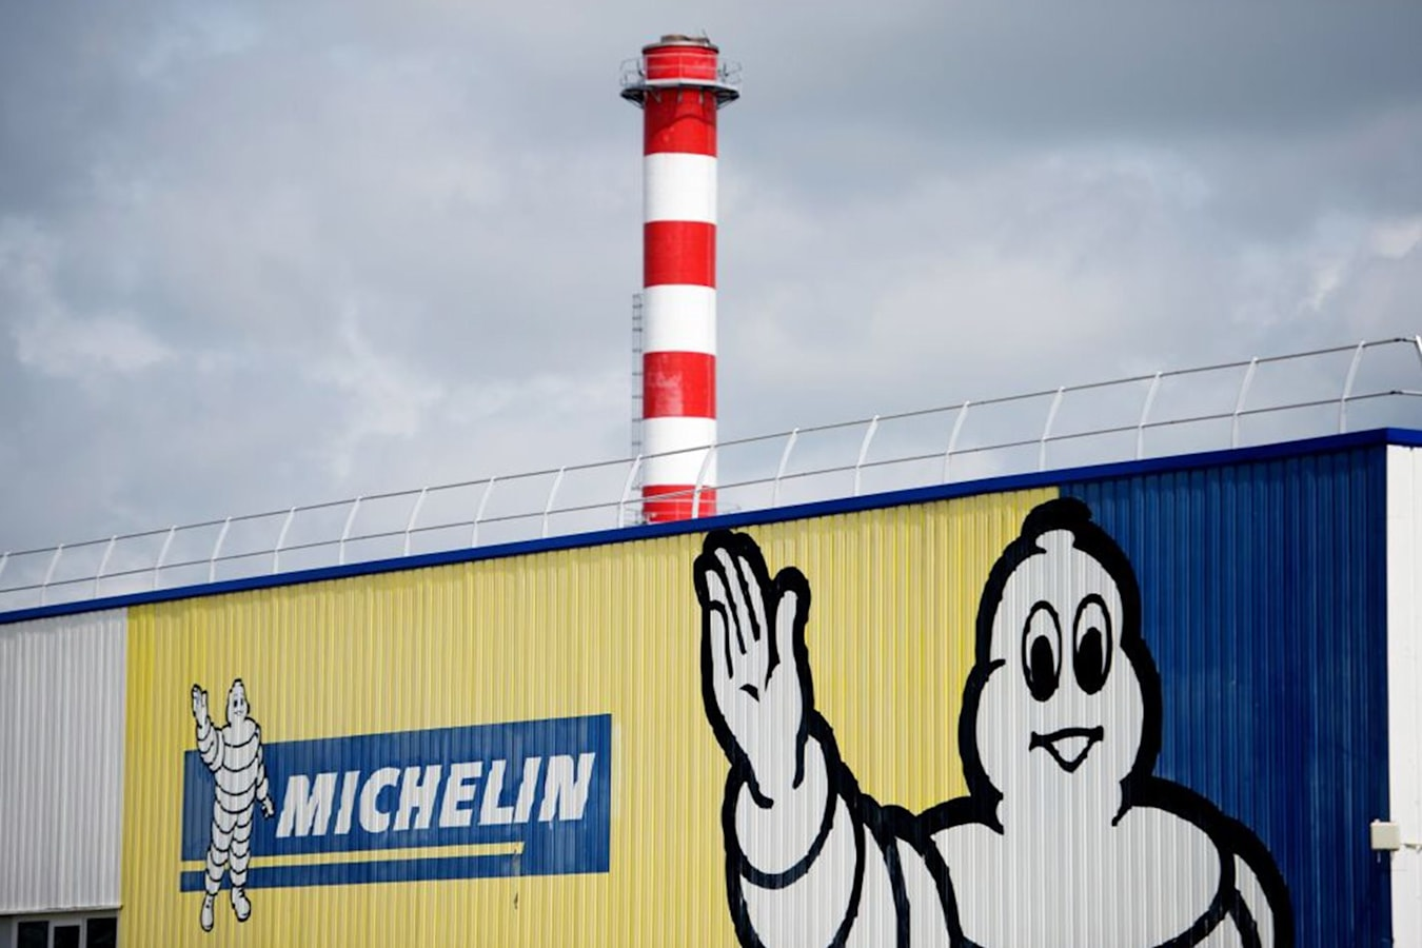 Archive Whichcar 2018 07 13 1 Michelin